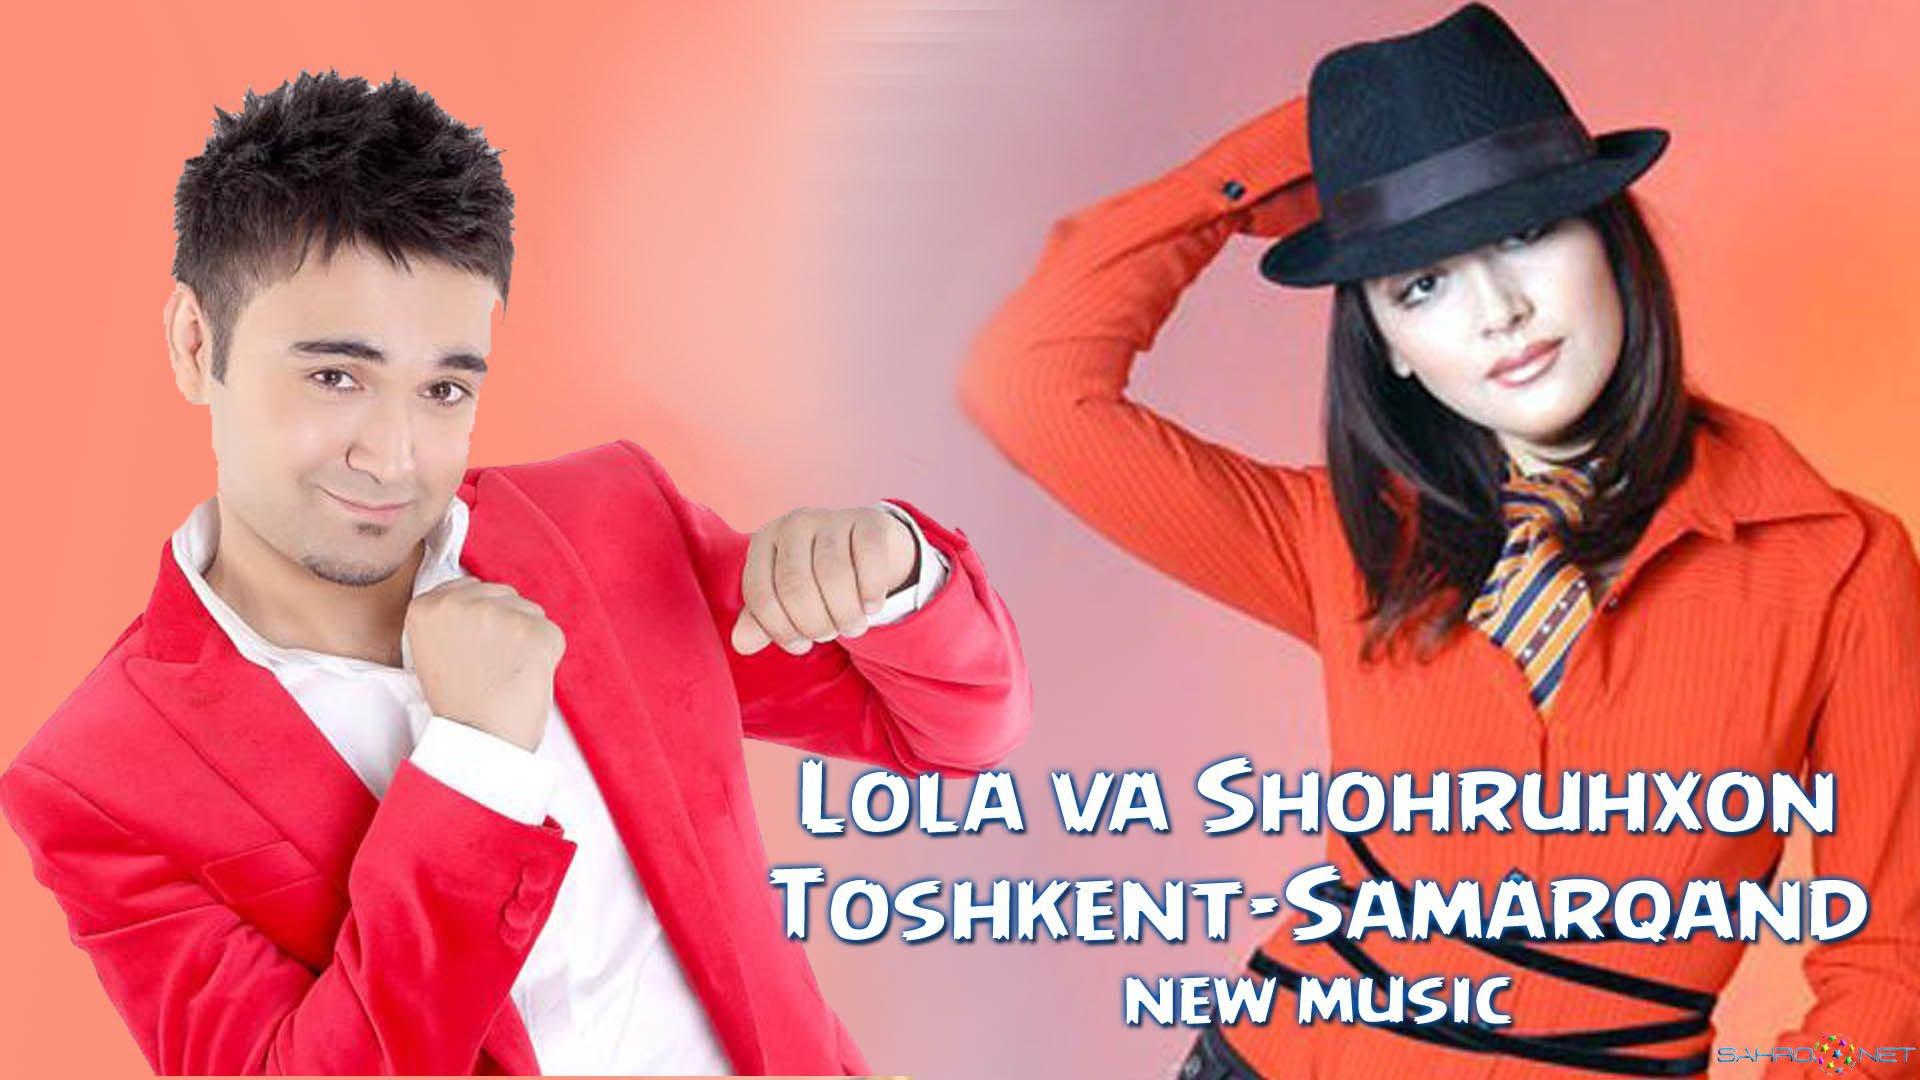 Lola va Shohruhxon - Toshkent-Samarqand 2015 скачать Узб MP3 бесплатно